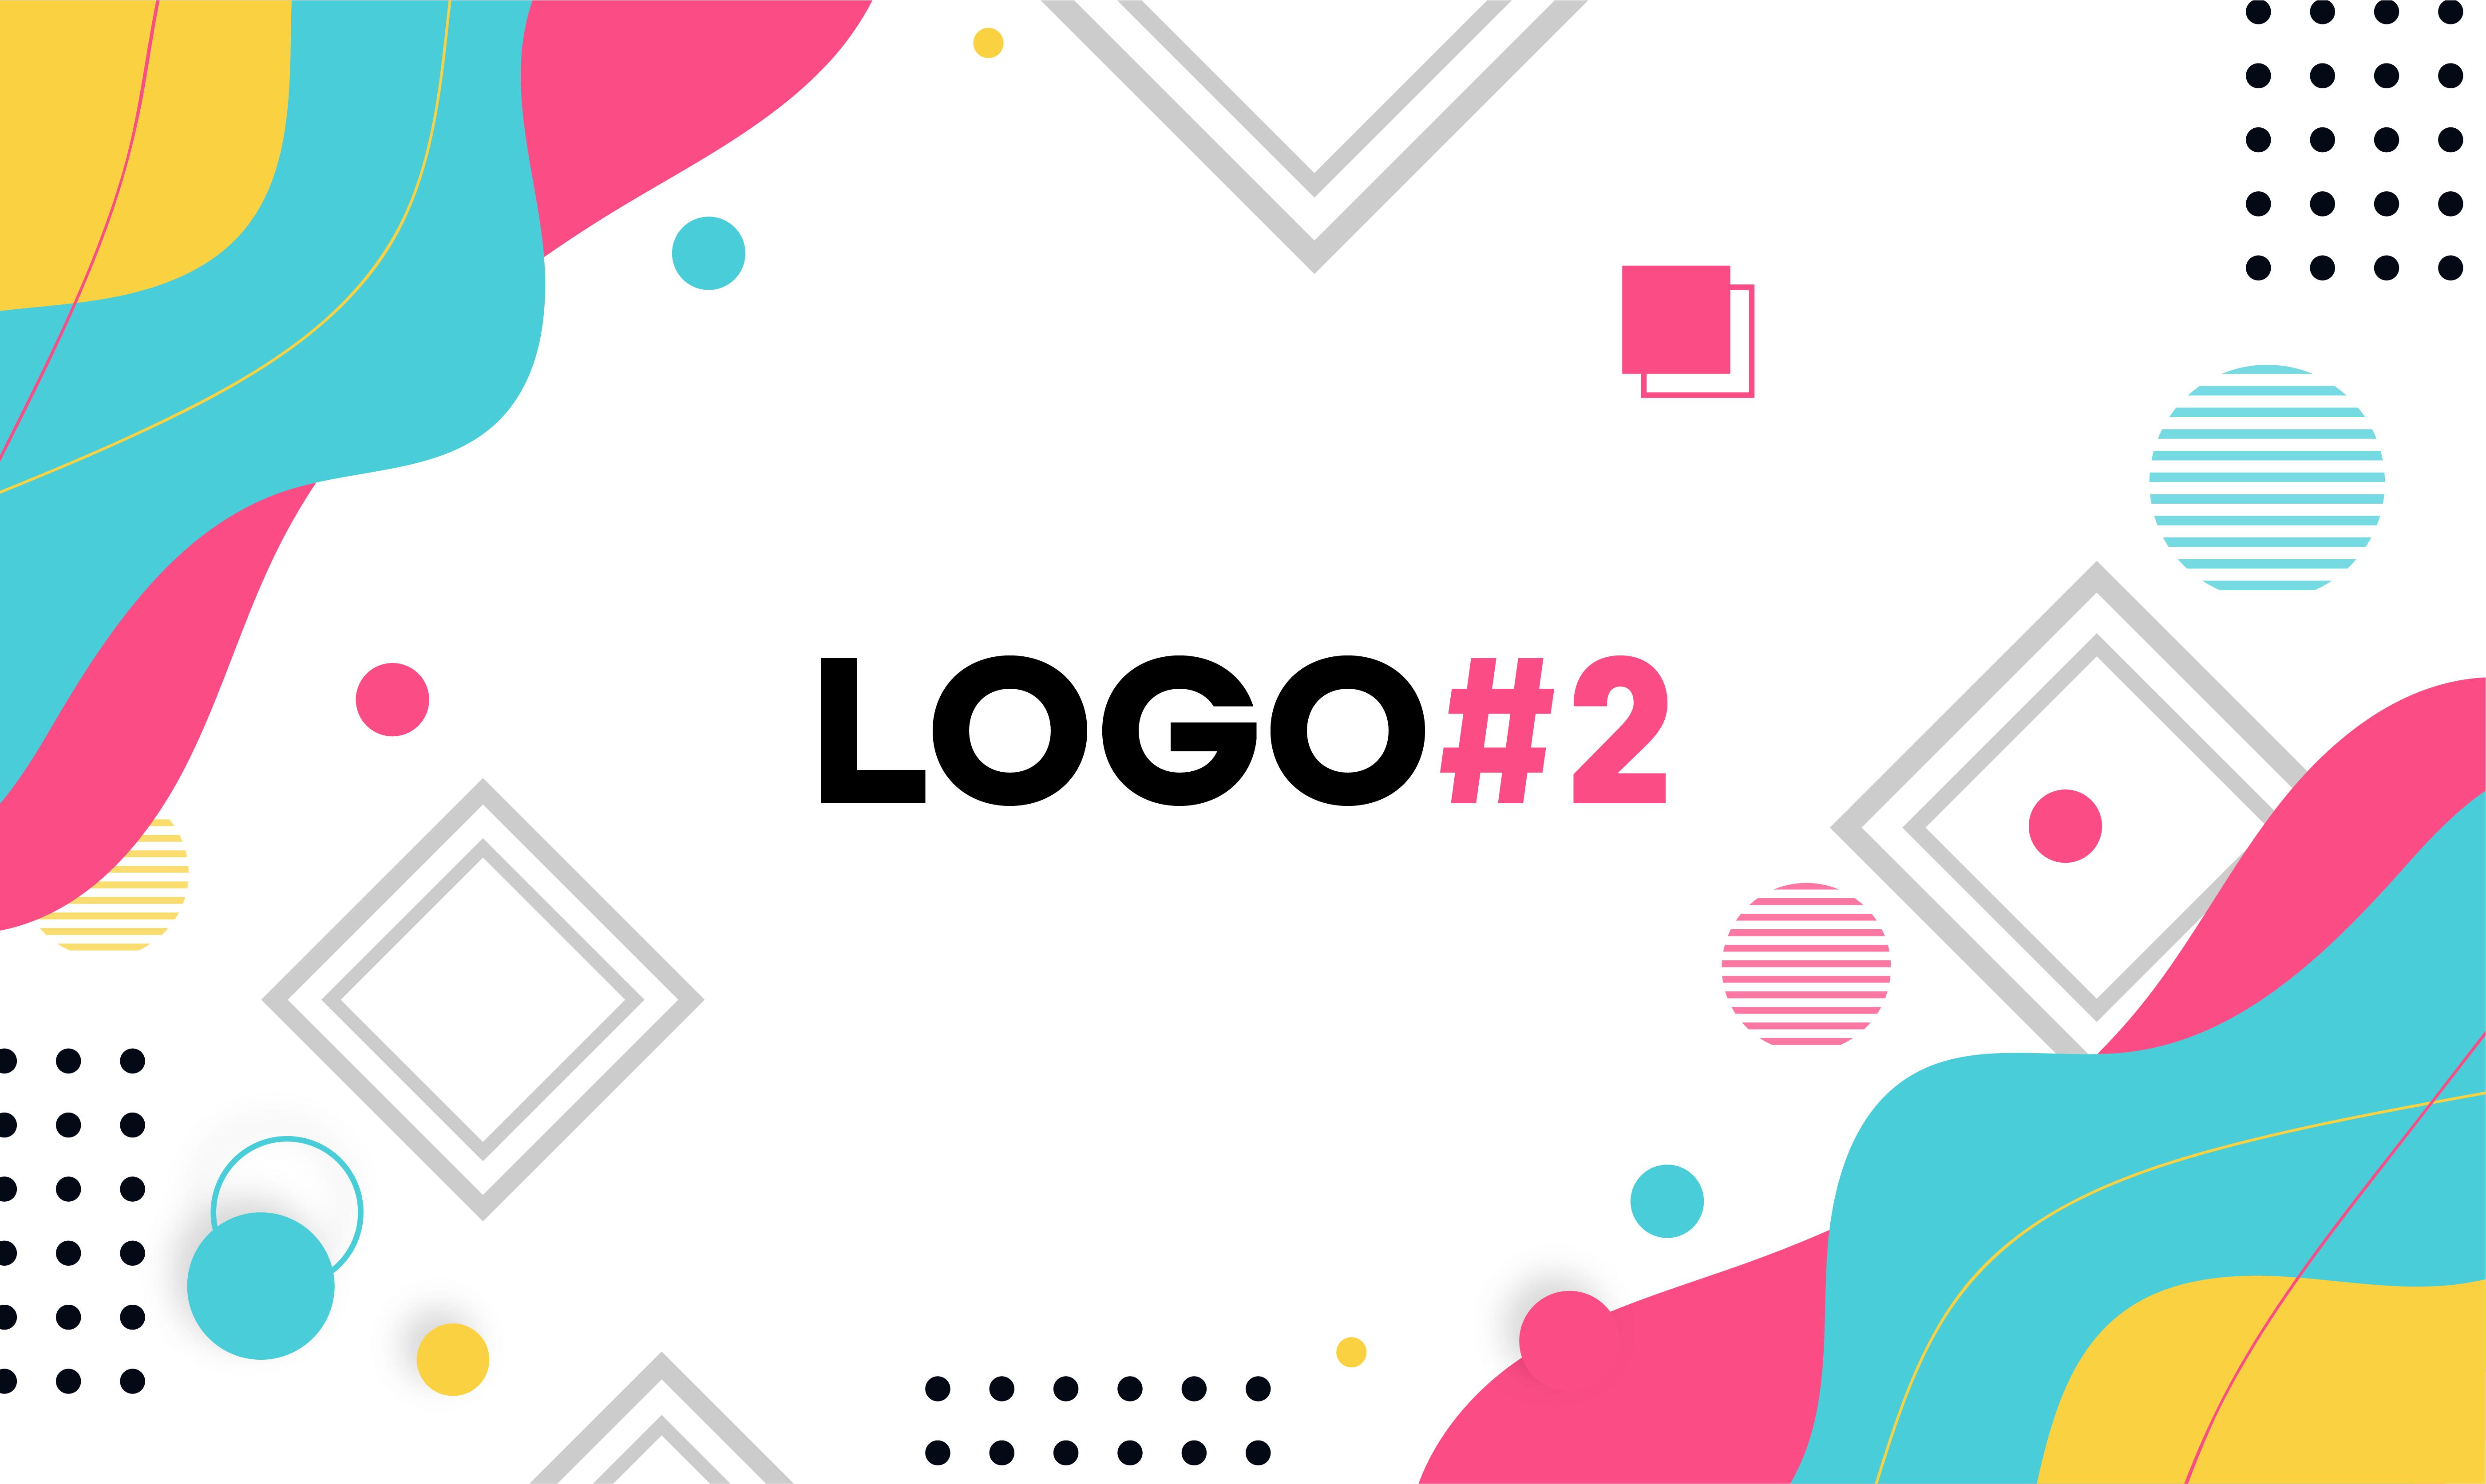 Logo proces powstawania